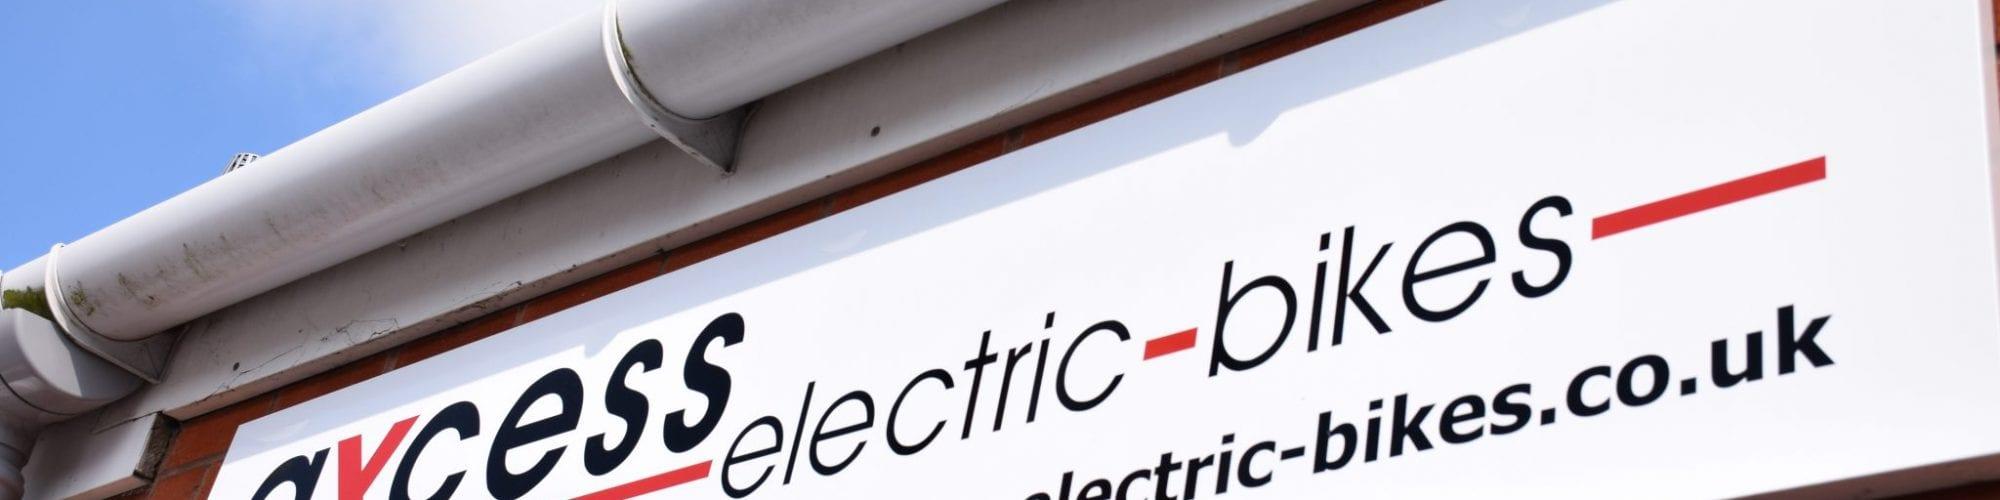 AXcess Electric Bikes Honiton